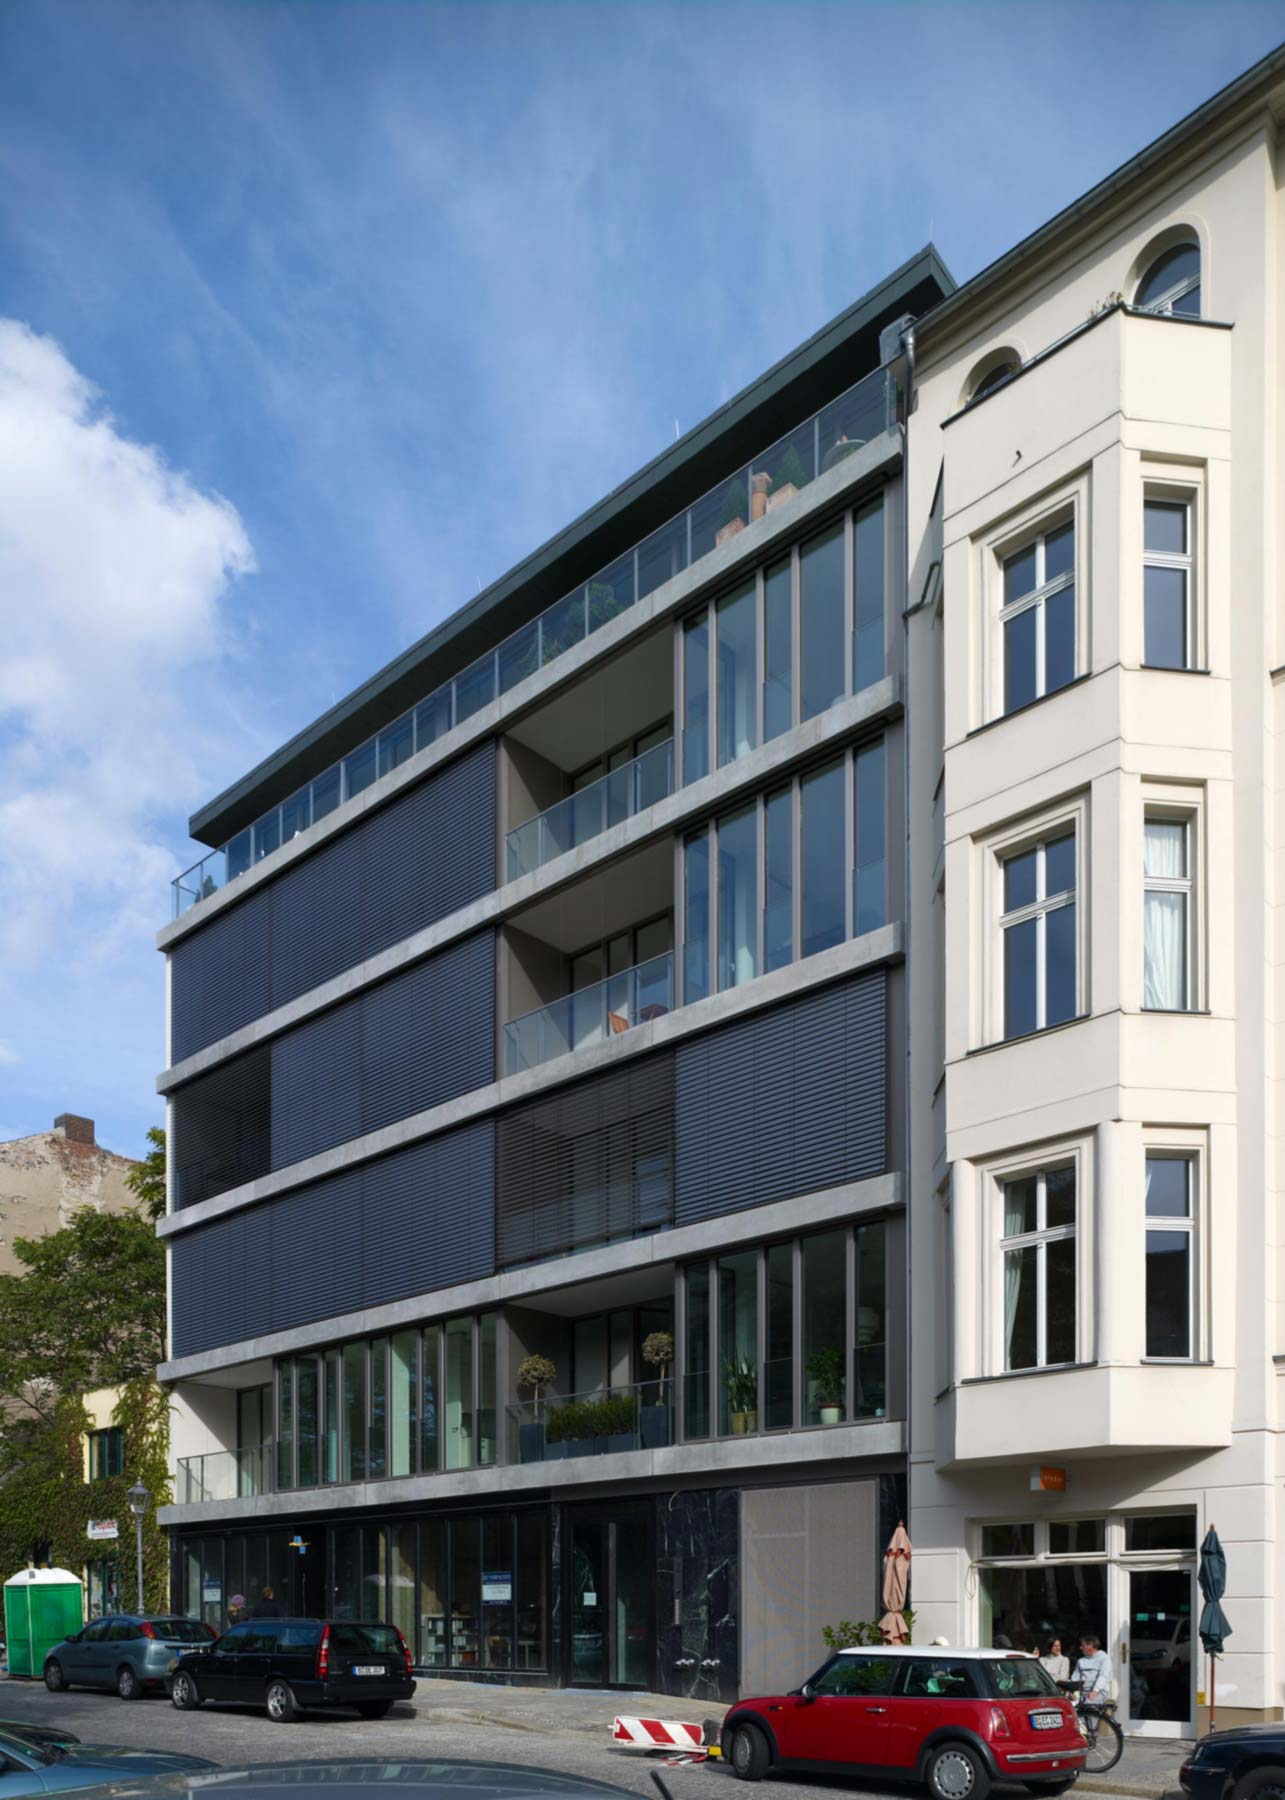 klaus-schlosser-architects-projekt_ELISABETHKIRCHE-01-